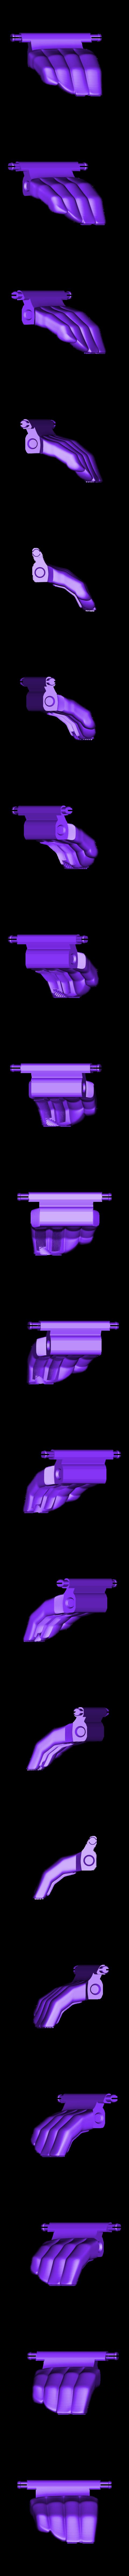 fingers6.stl Download free STL file Mechanical Prosthetic Concept Model • 3D printing design, boldmachines